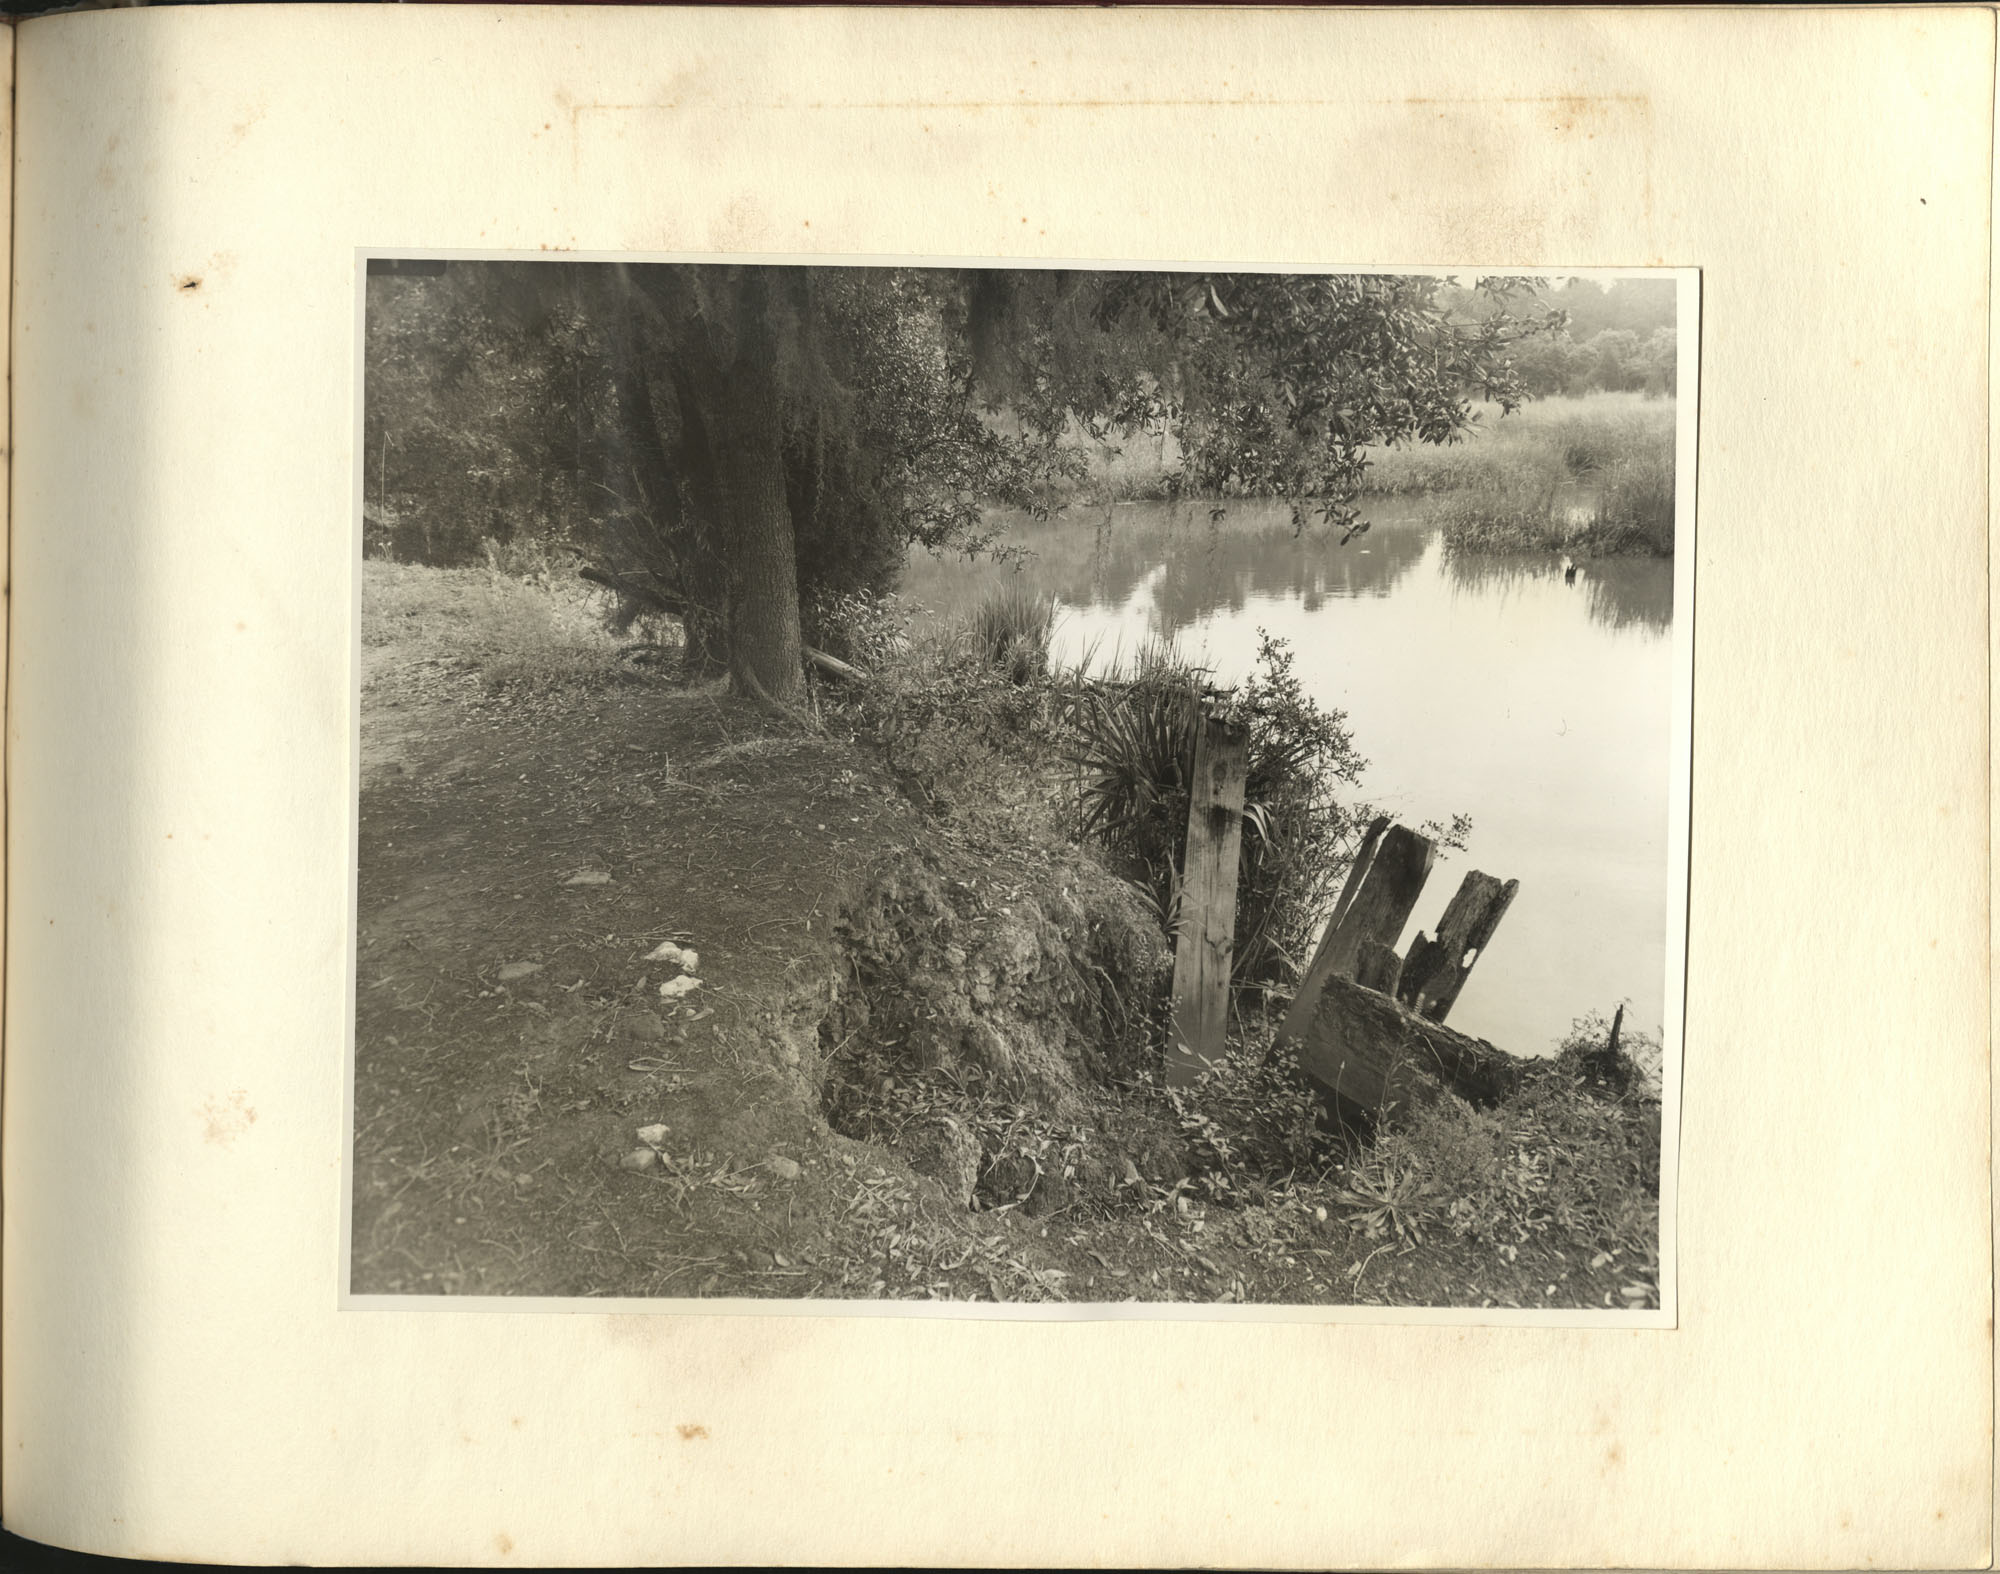 Medway Plantation Photograph Album, 1949, page 145